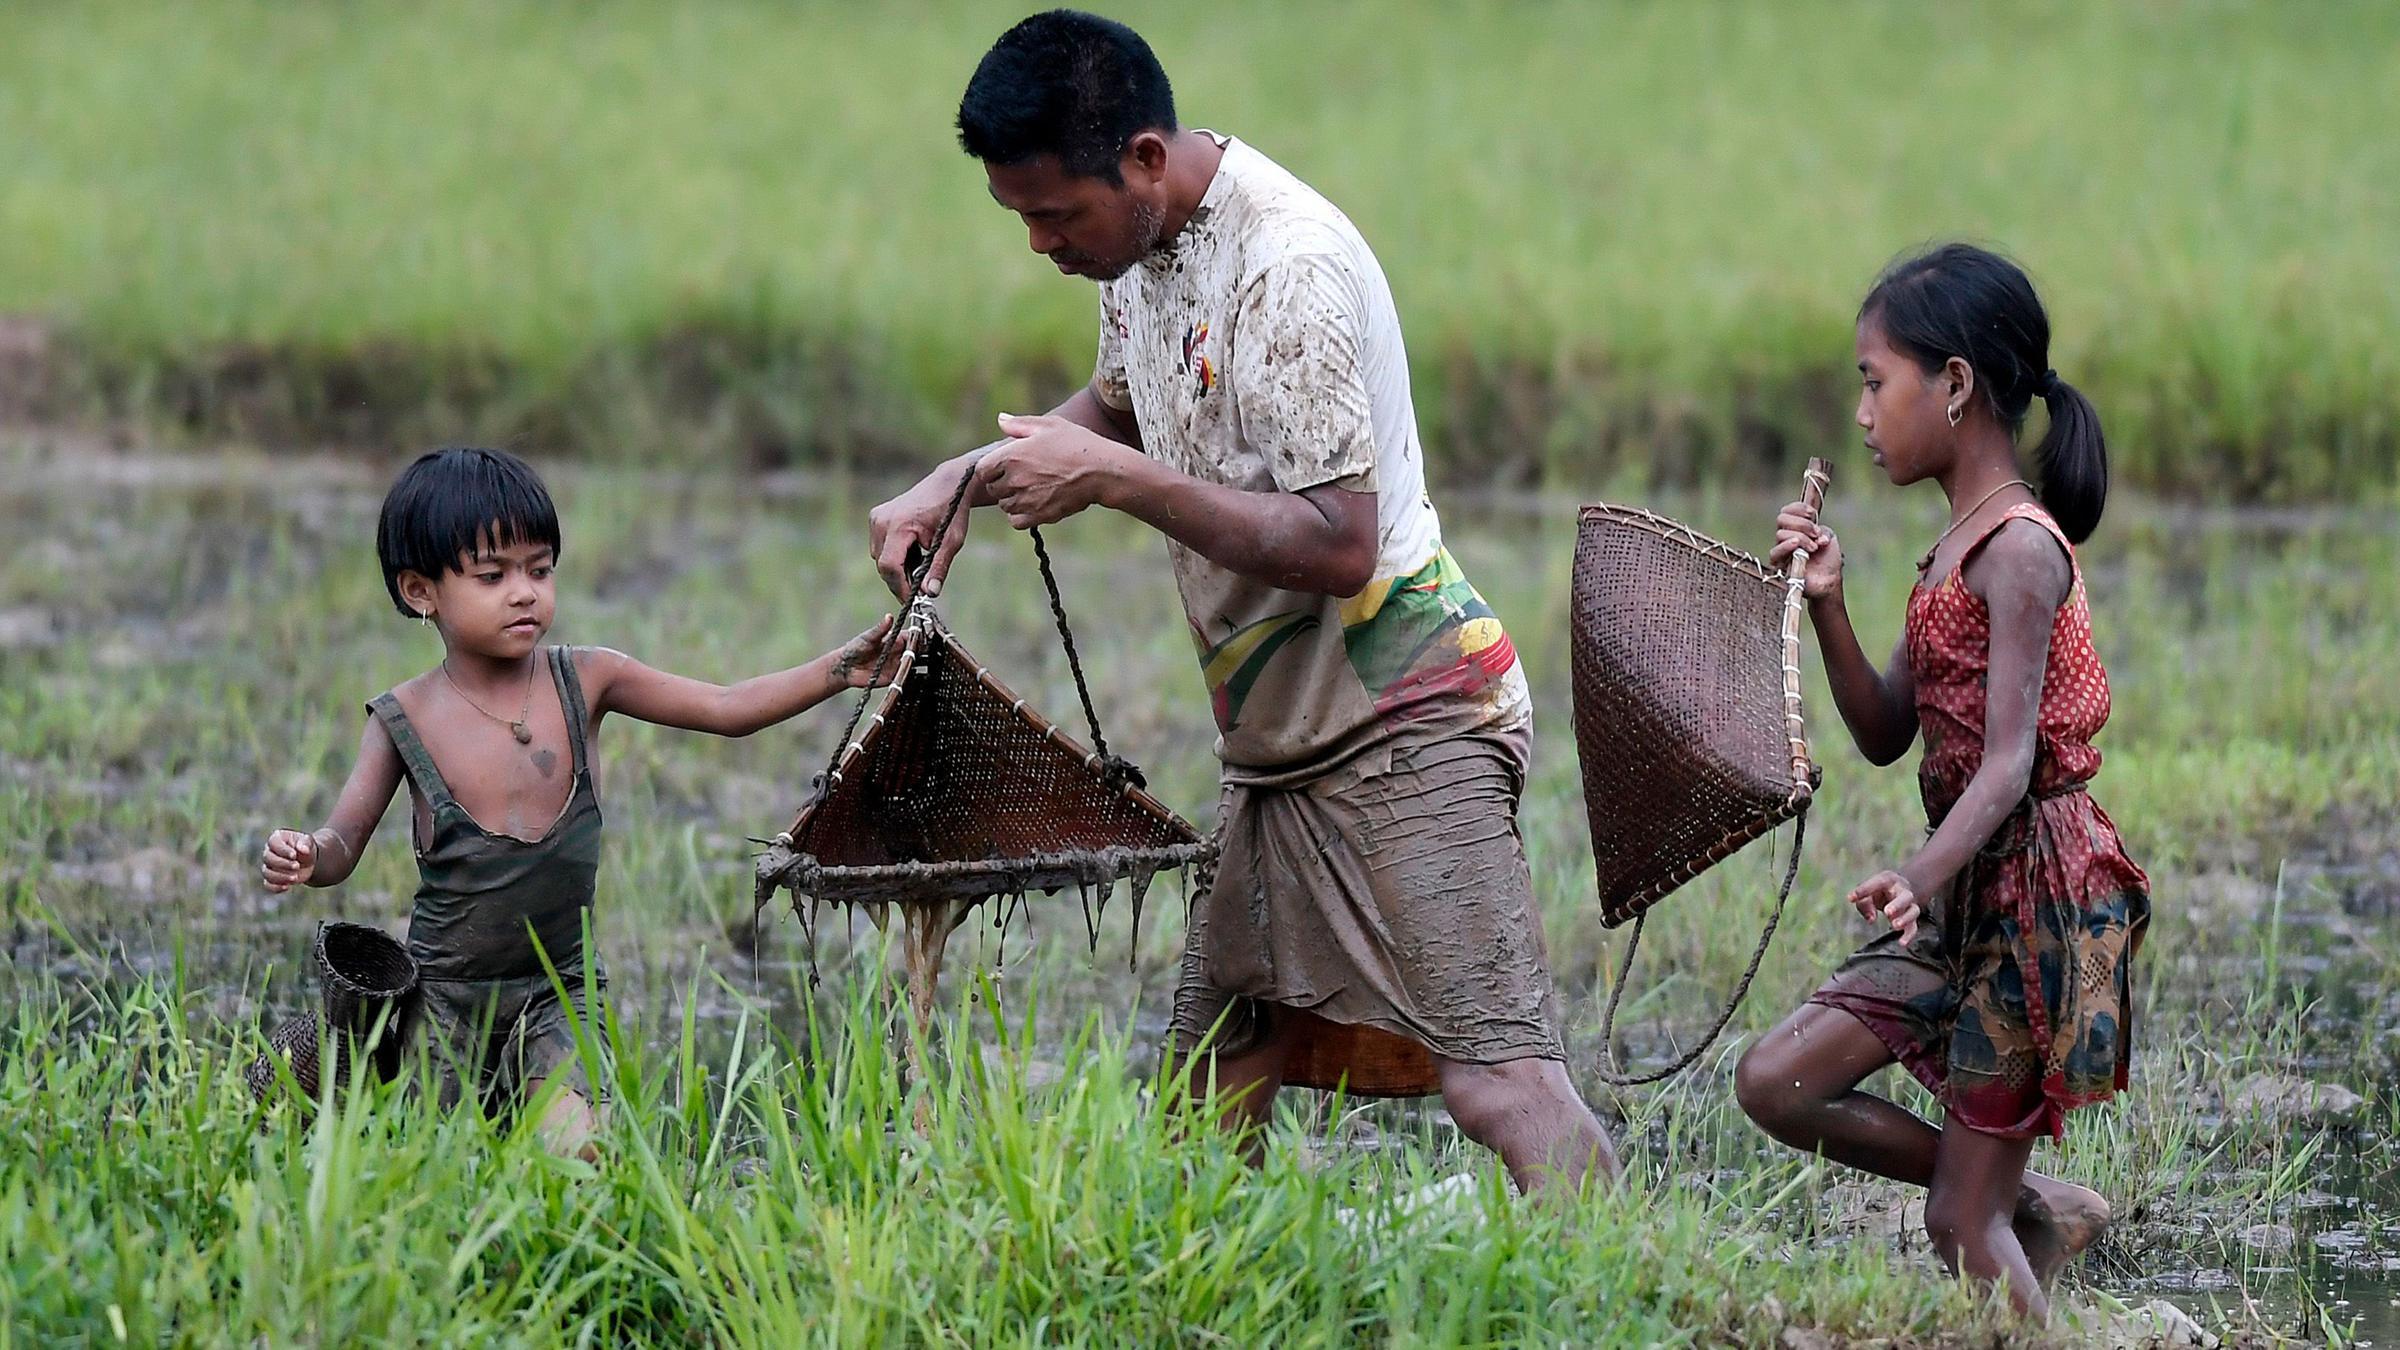 Für kinderarbeit heute gründe I§I Kinderarbeit: